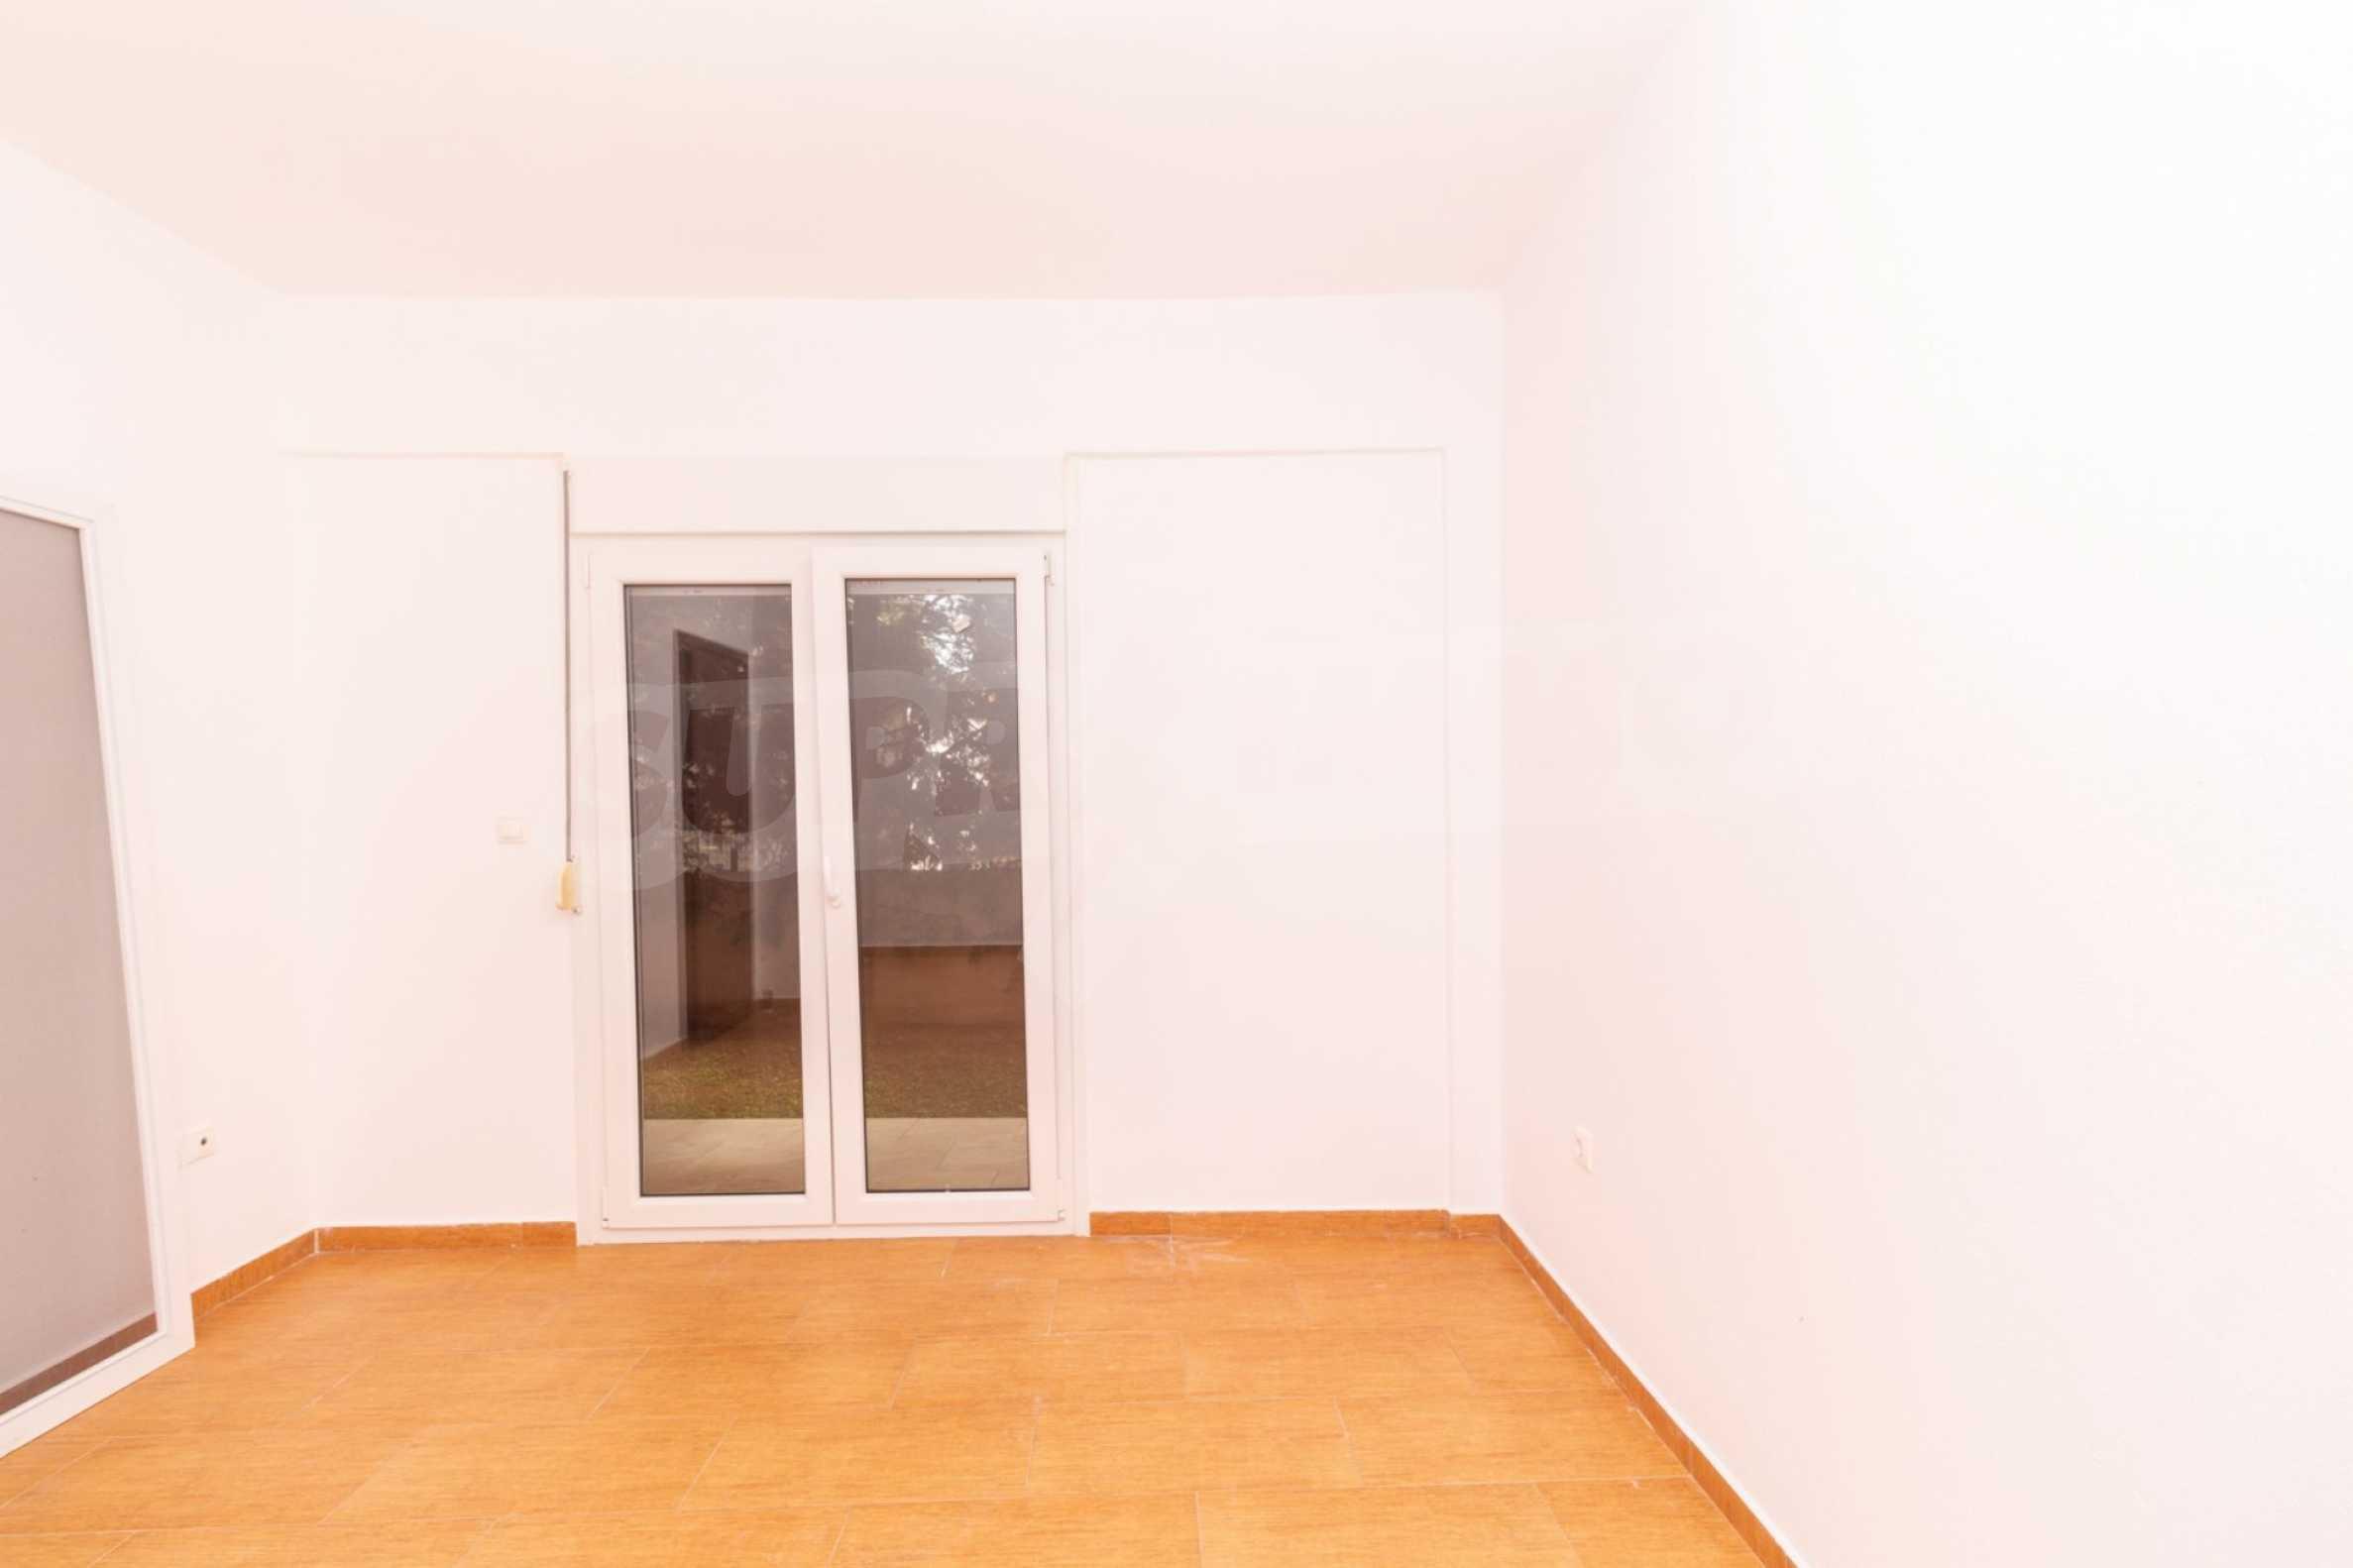 тристаен апартамент в Потидея, Касандра 27